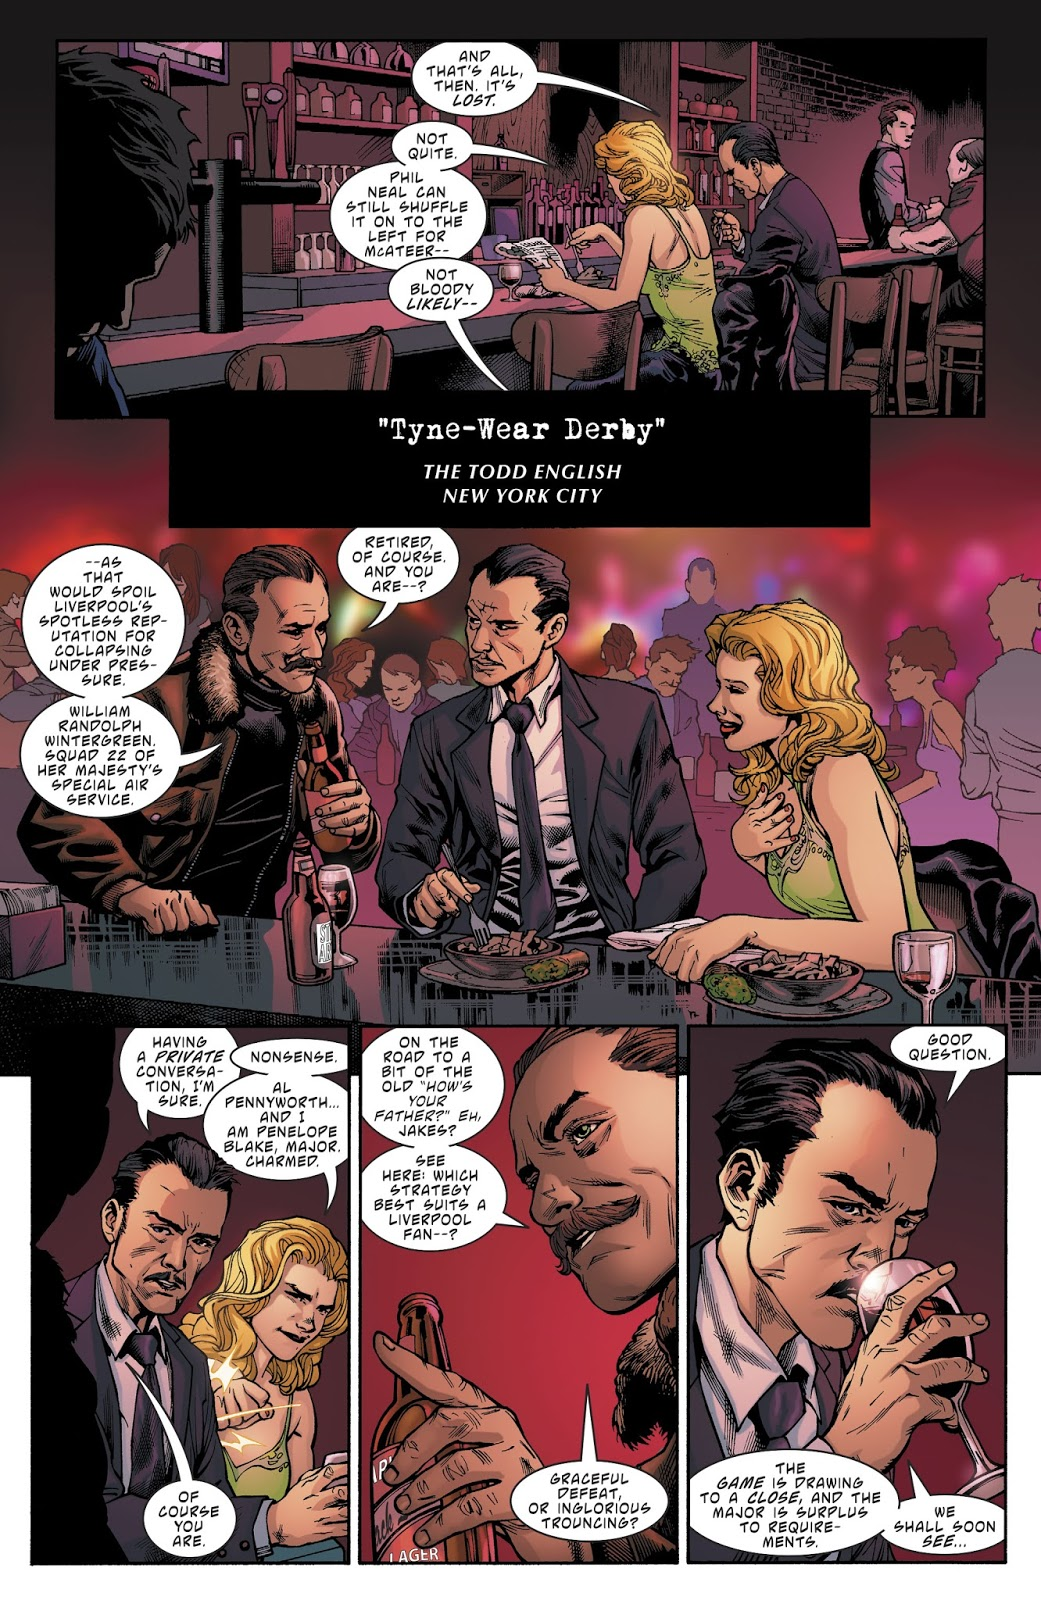 Alfred and Wintergreen: The True Stars of Batman vs. Deathstroke